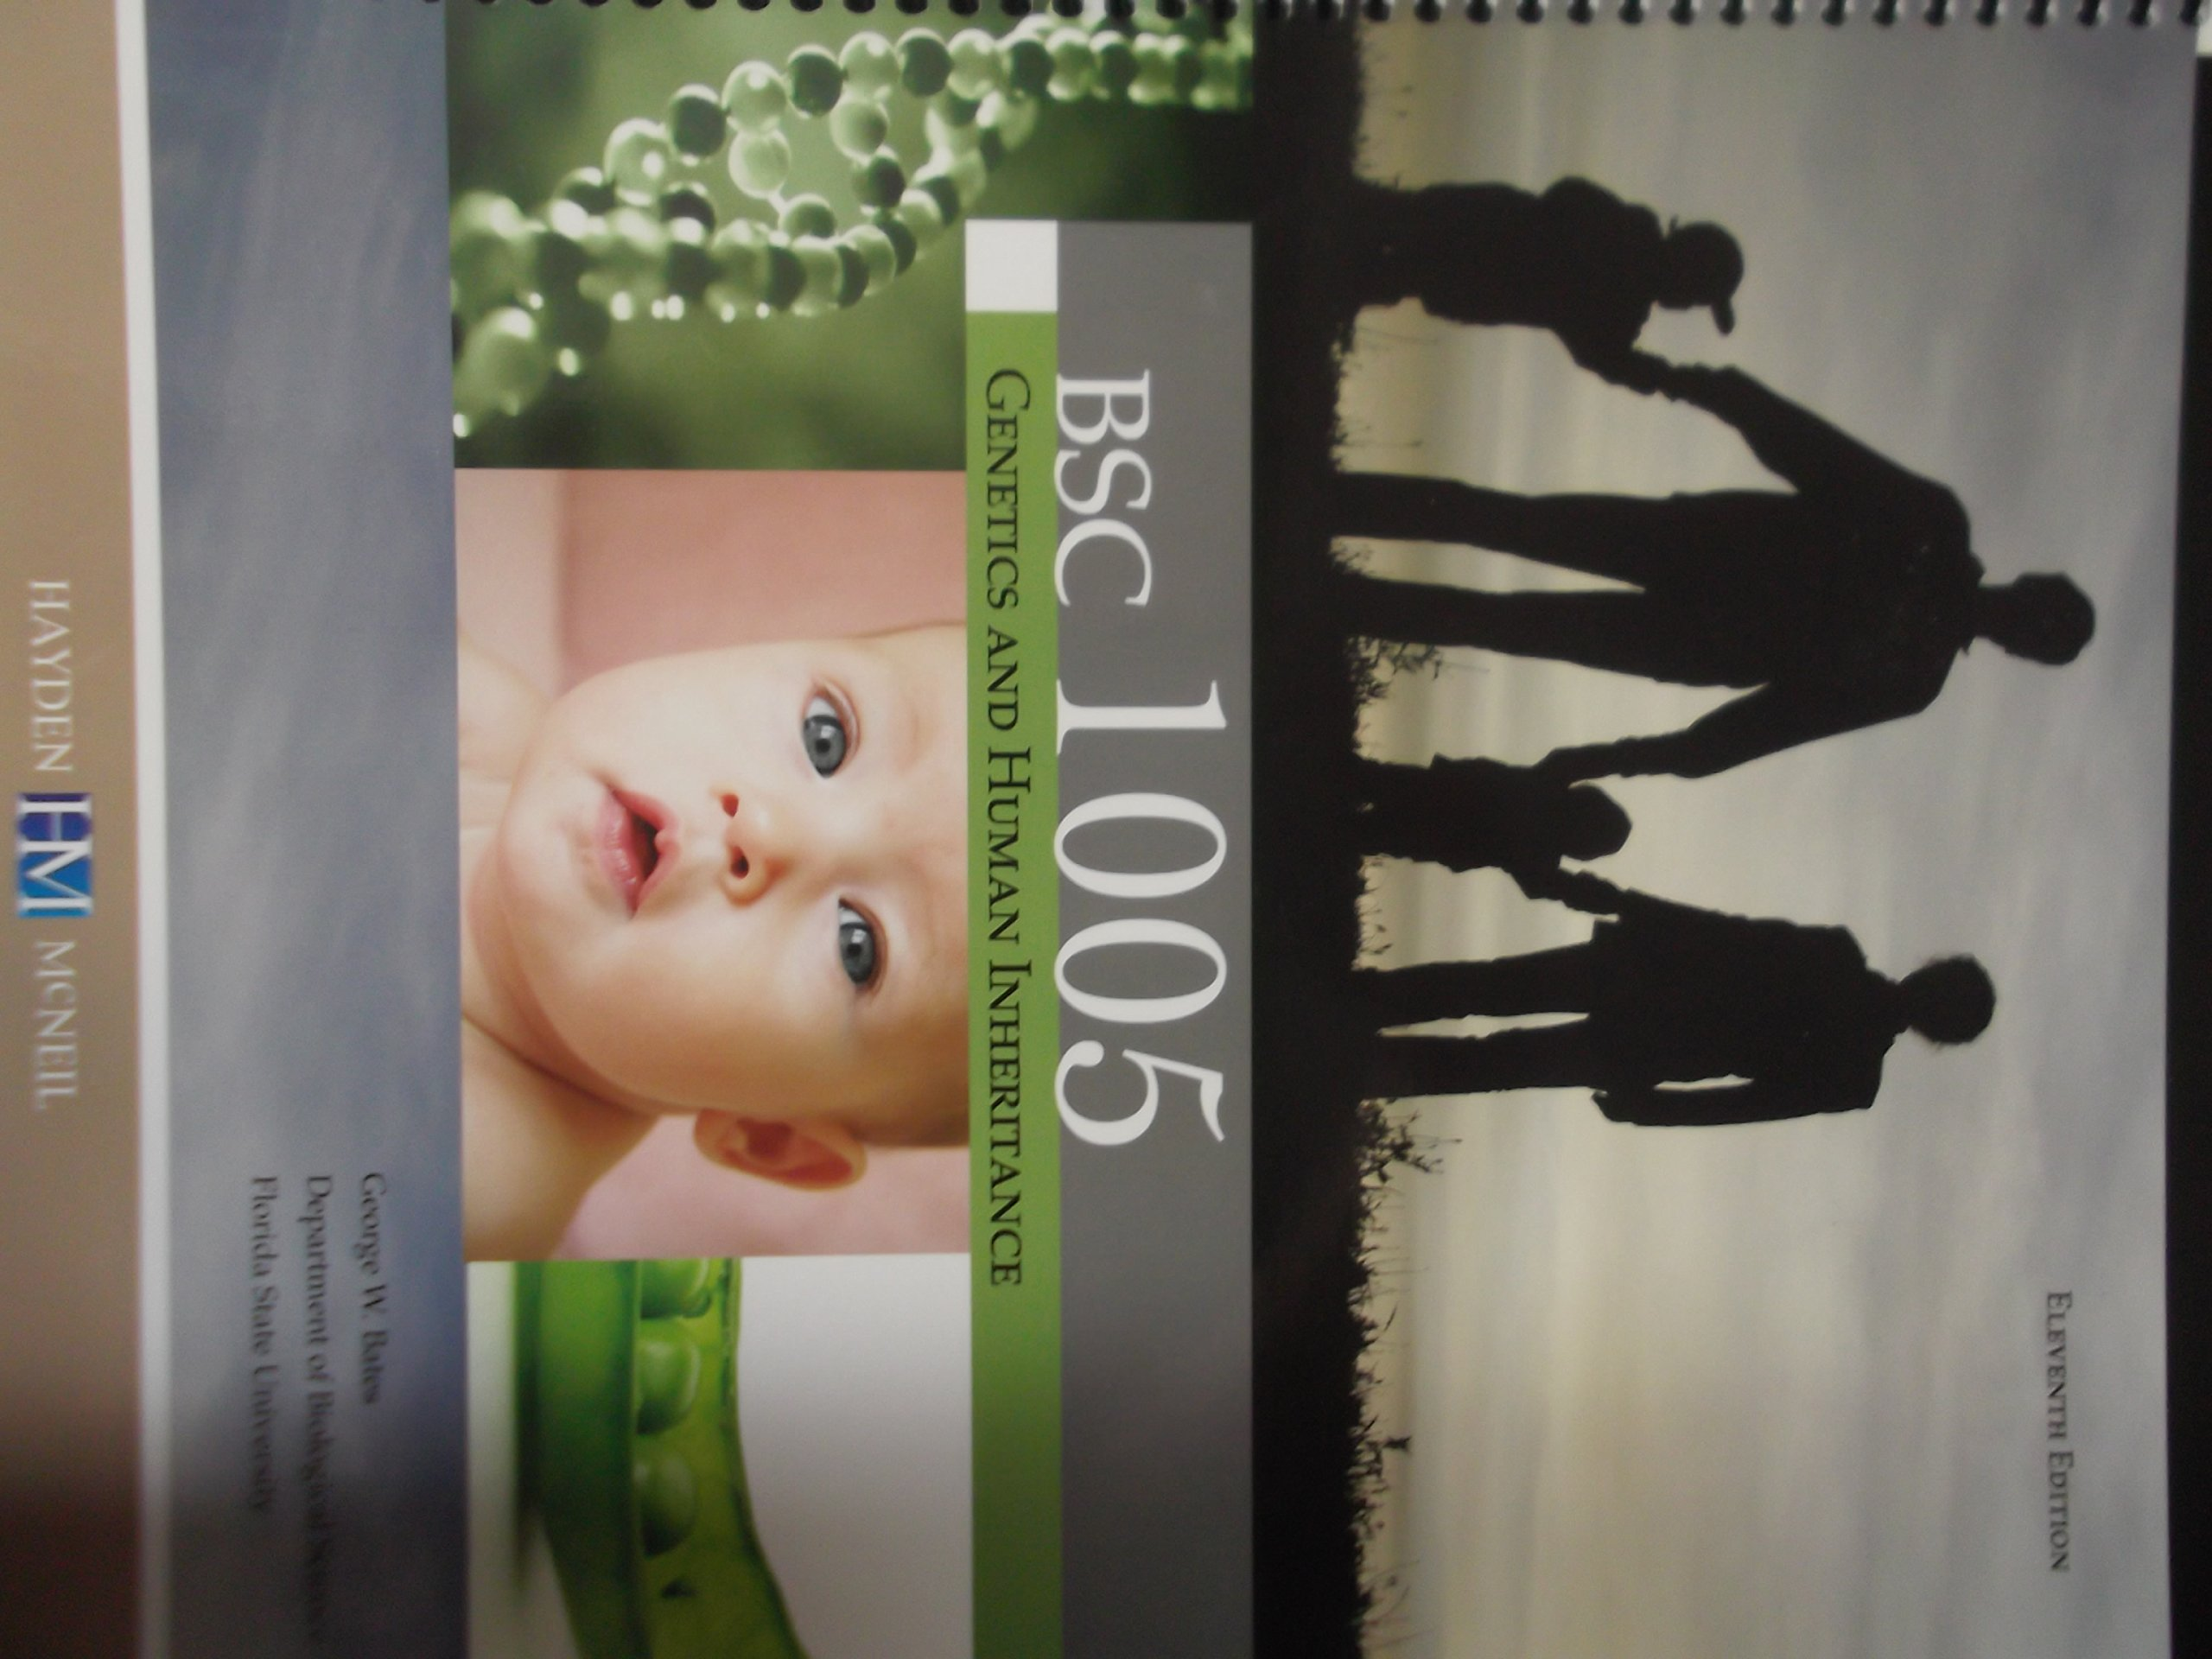 Download Genetics and Human Inheritance 11th Edition Bsc 1005 PDF